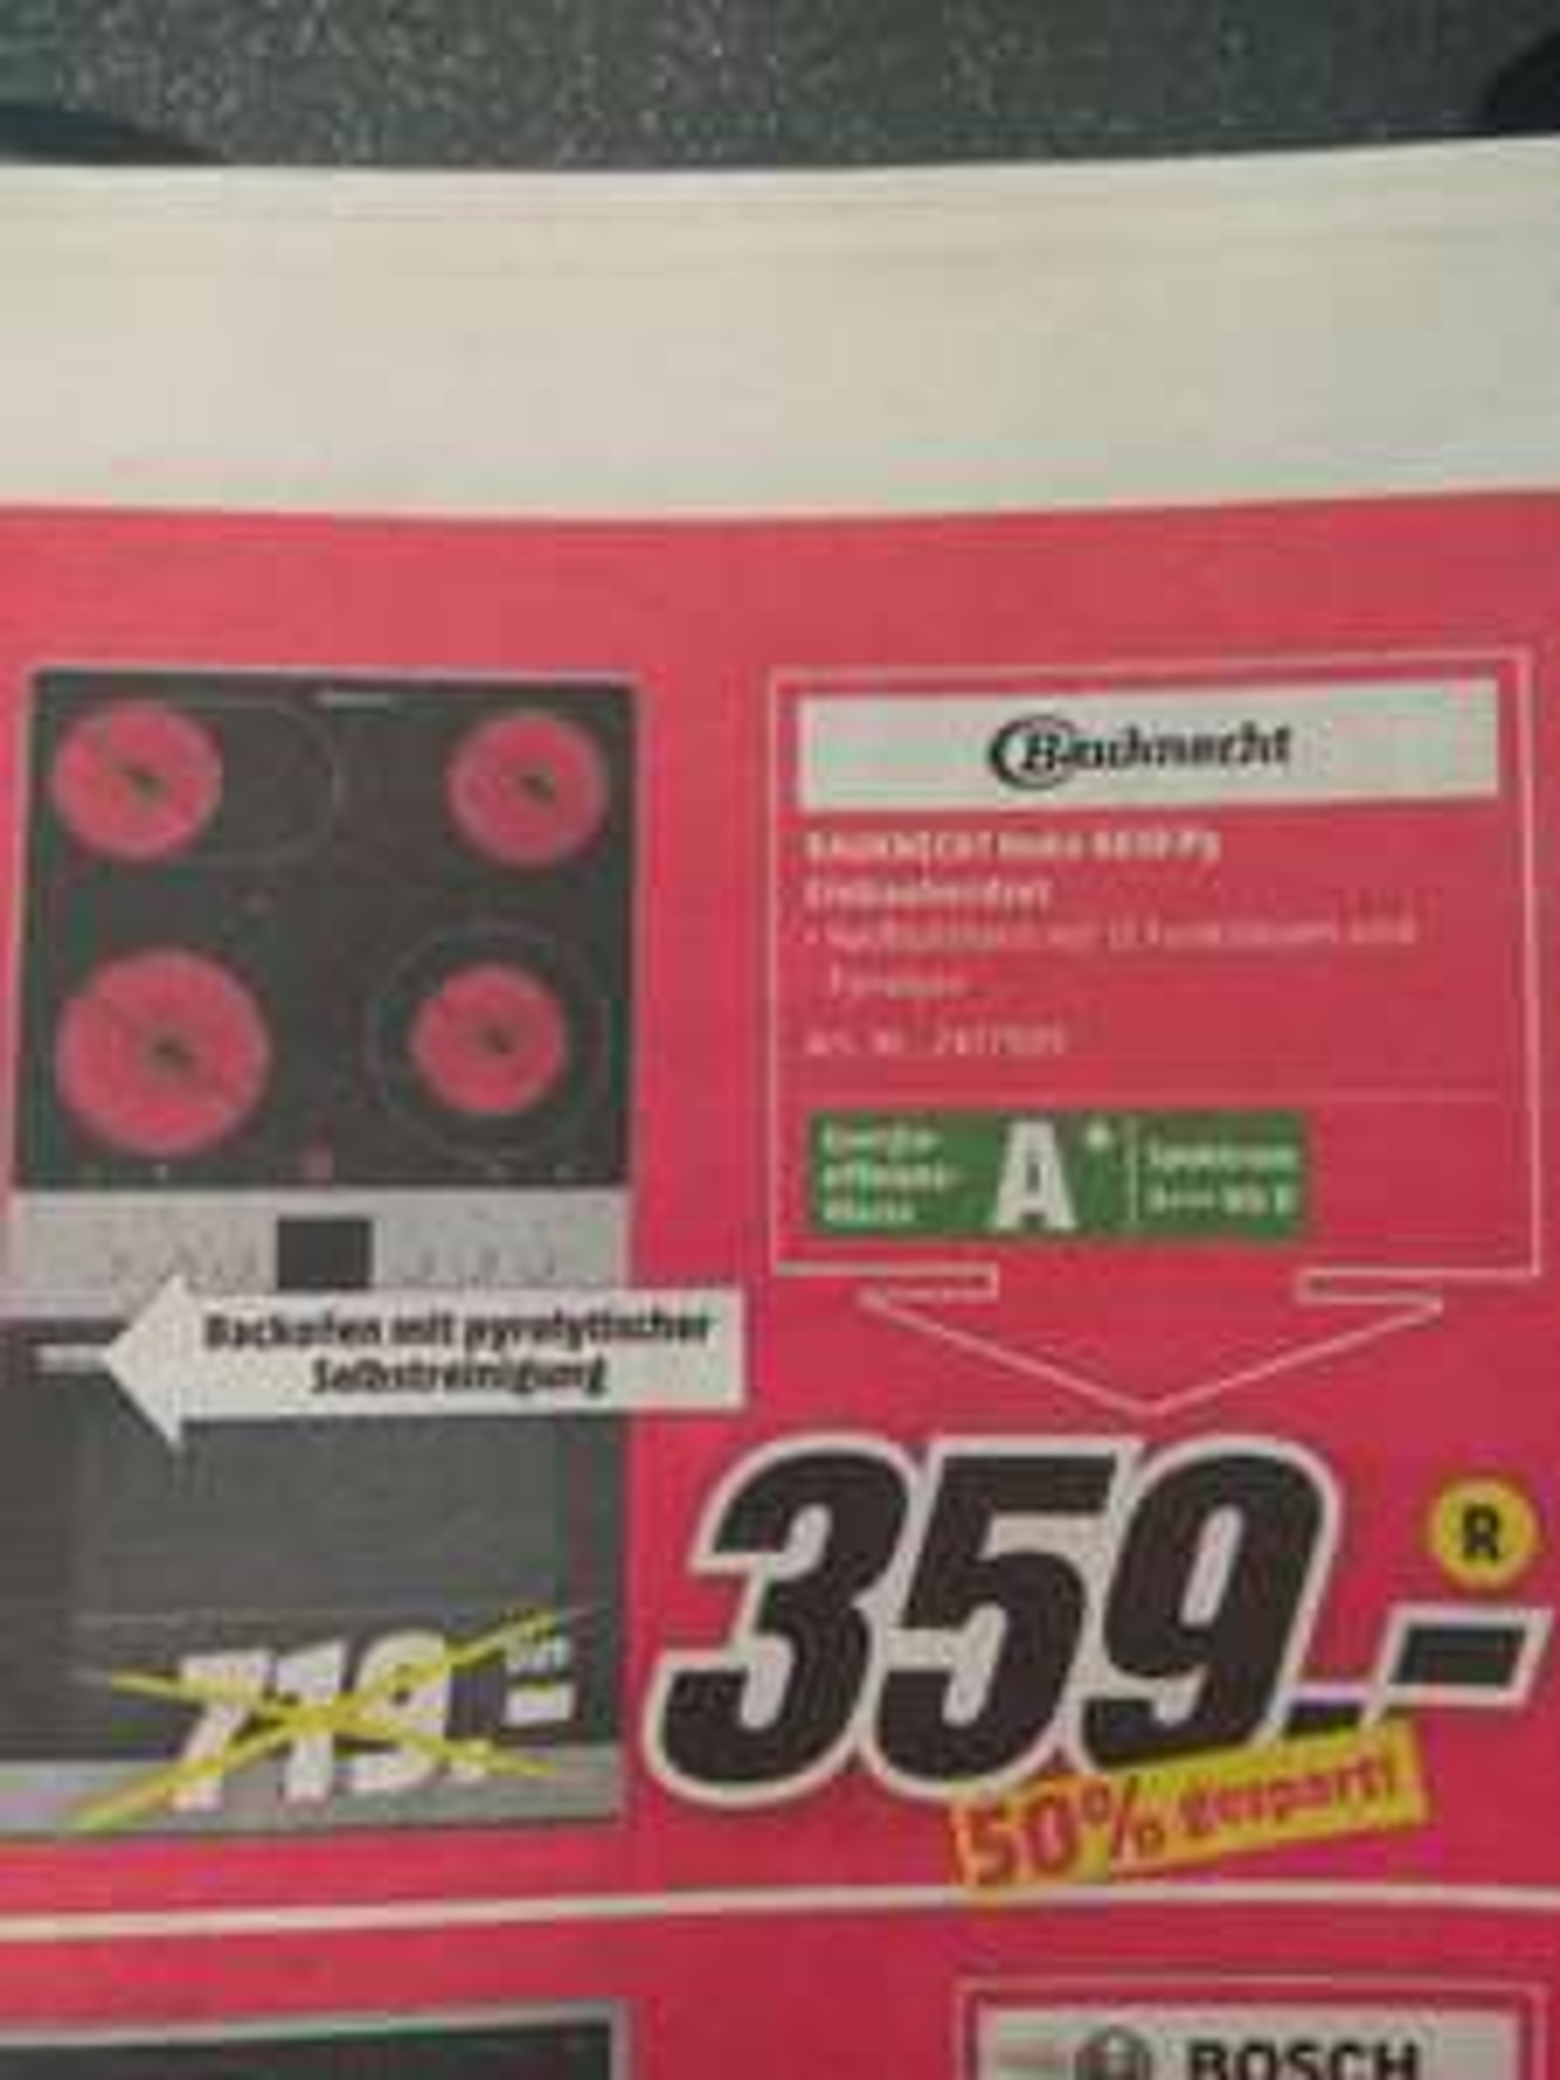 Kassel Media-Markt Bauknecht Heko 4610 Py Tiefstpreis lokal